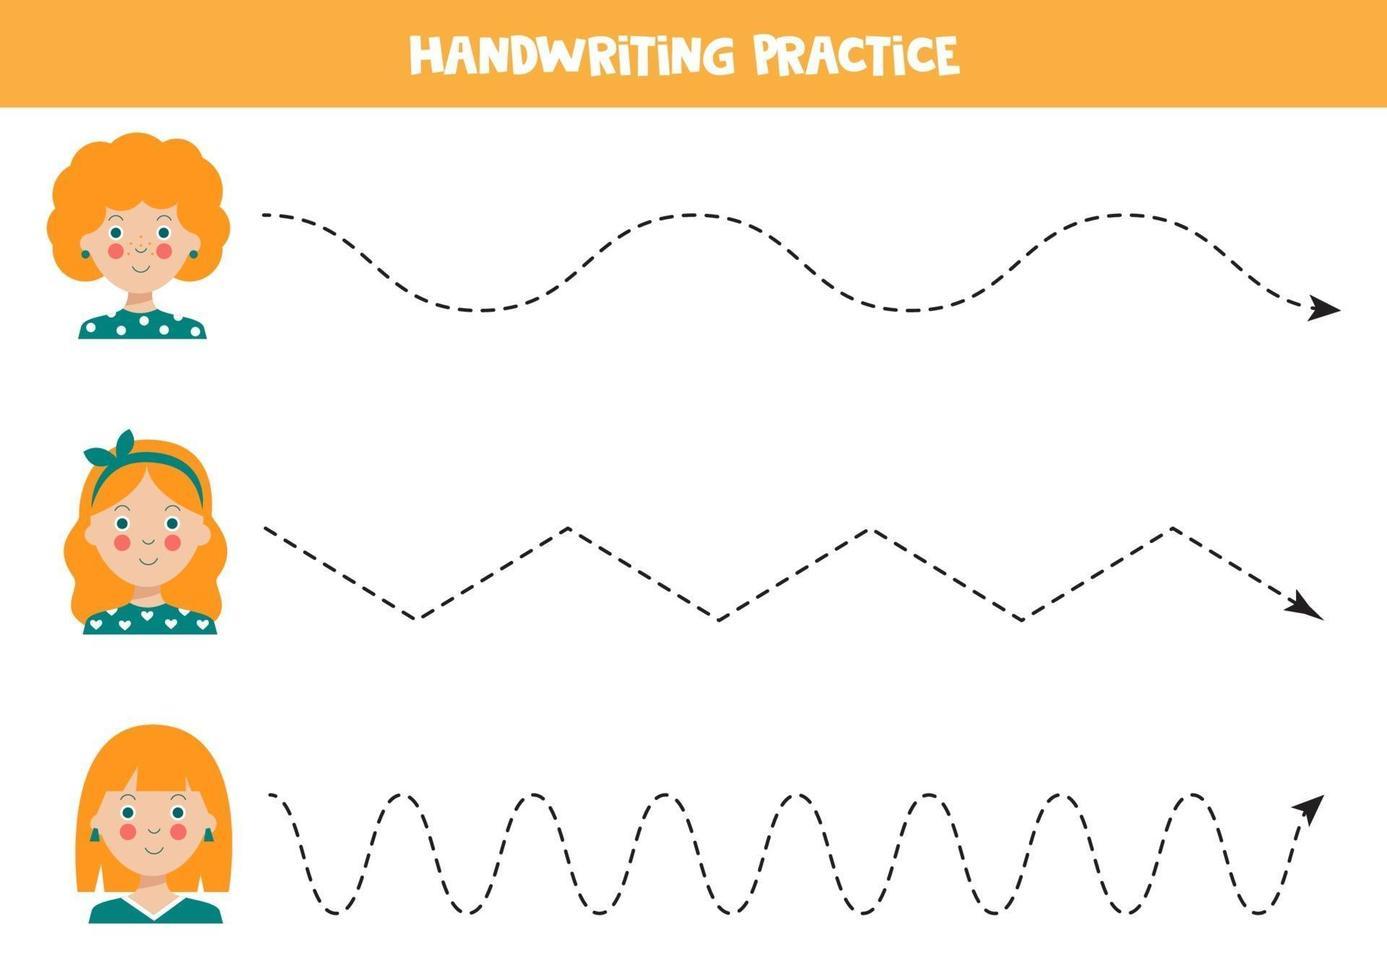 traza las líneas con chicas lindas. práctica de habilidades de escritura. vector